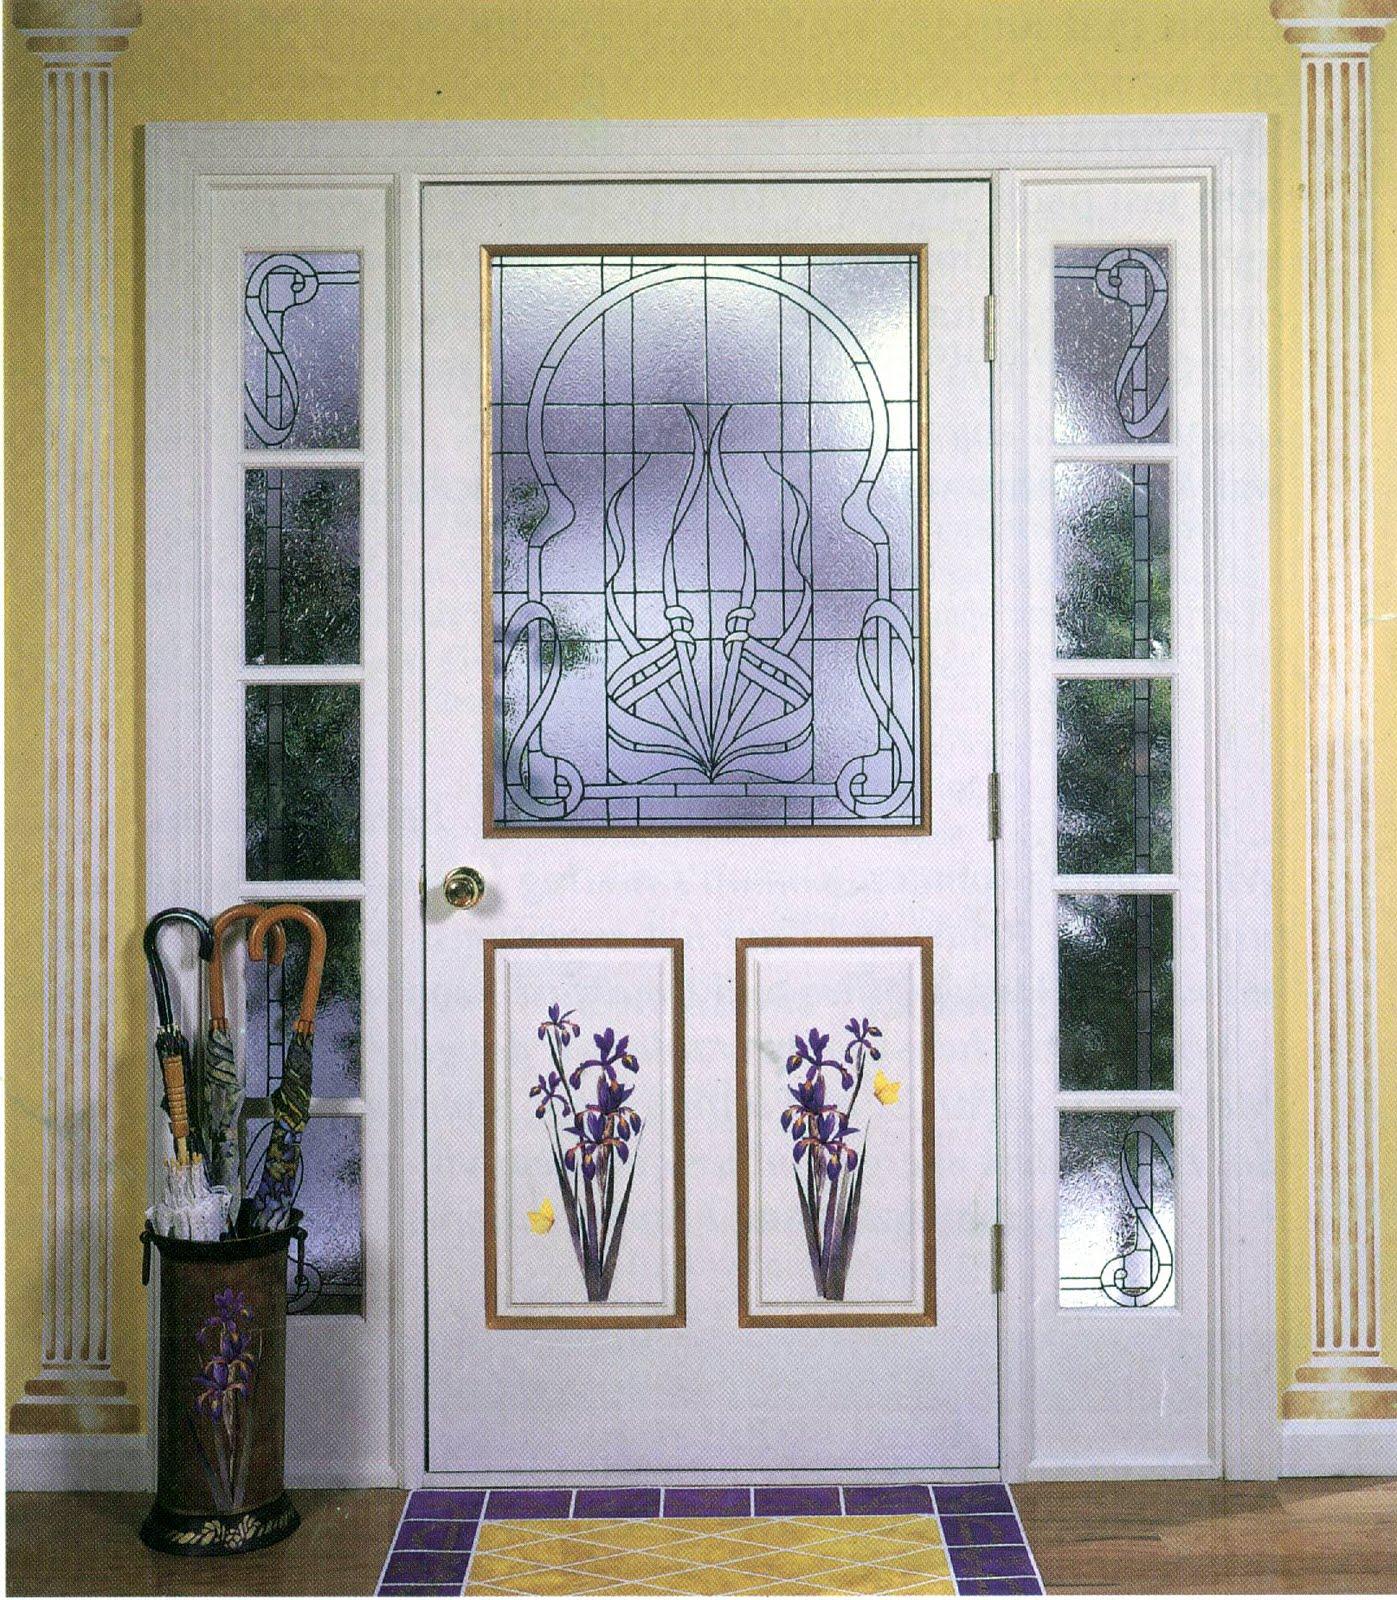 Gallery Glass Class: Speaking of Irises and Doorways--